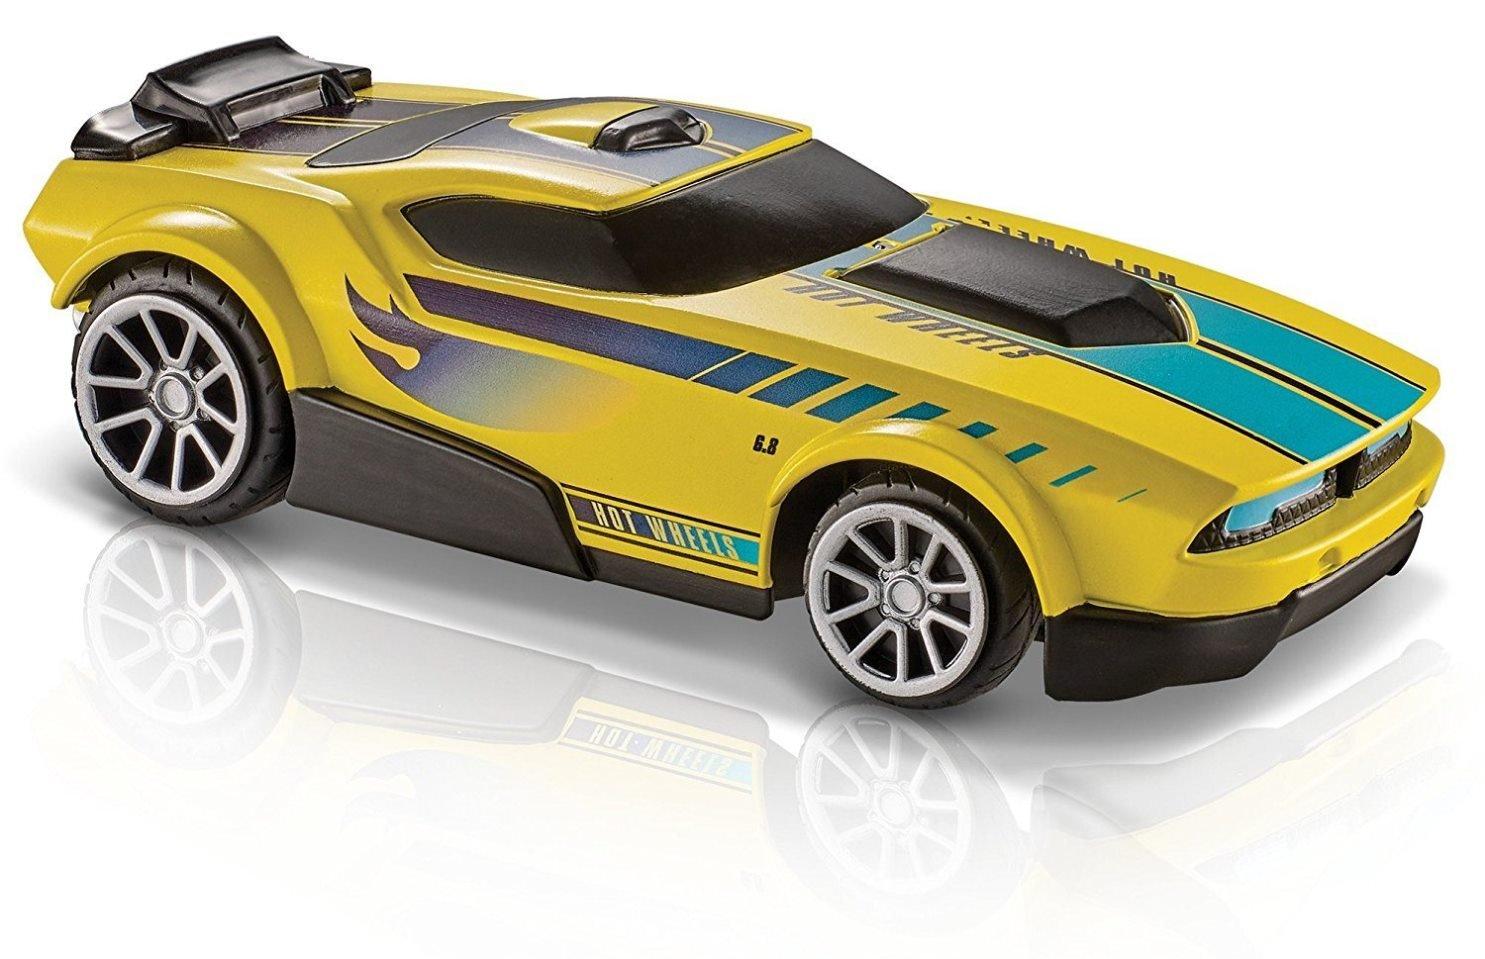 Hot Wheels Ai Starter Set Street Racing Edition by Hot Wheels (Image #13)